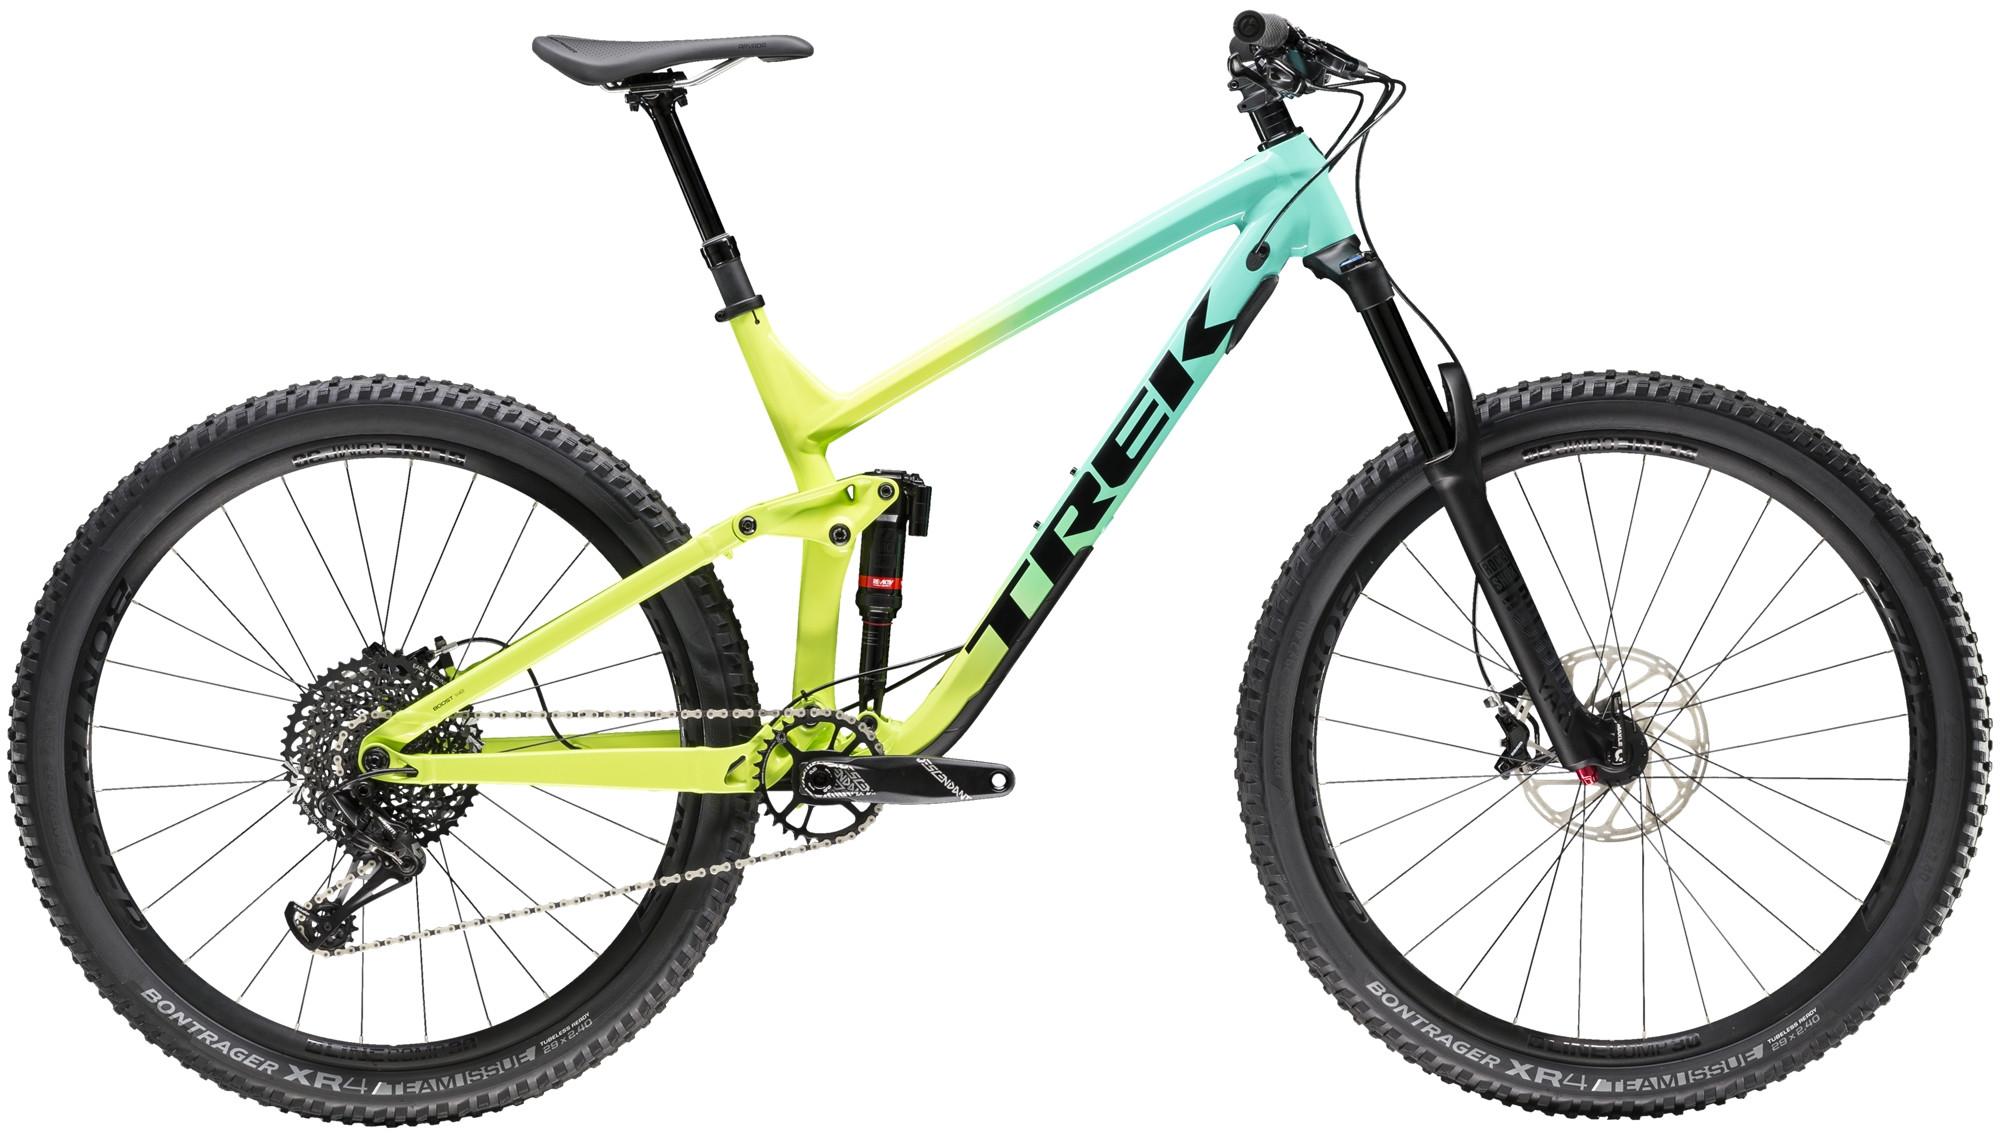 2020 Trek Slash 8 Full Suspension Mountain Bikes